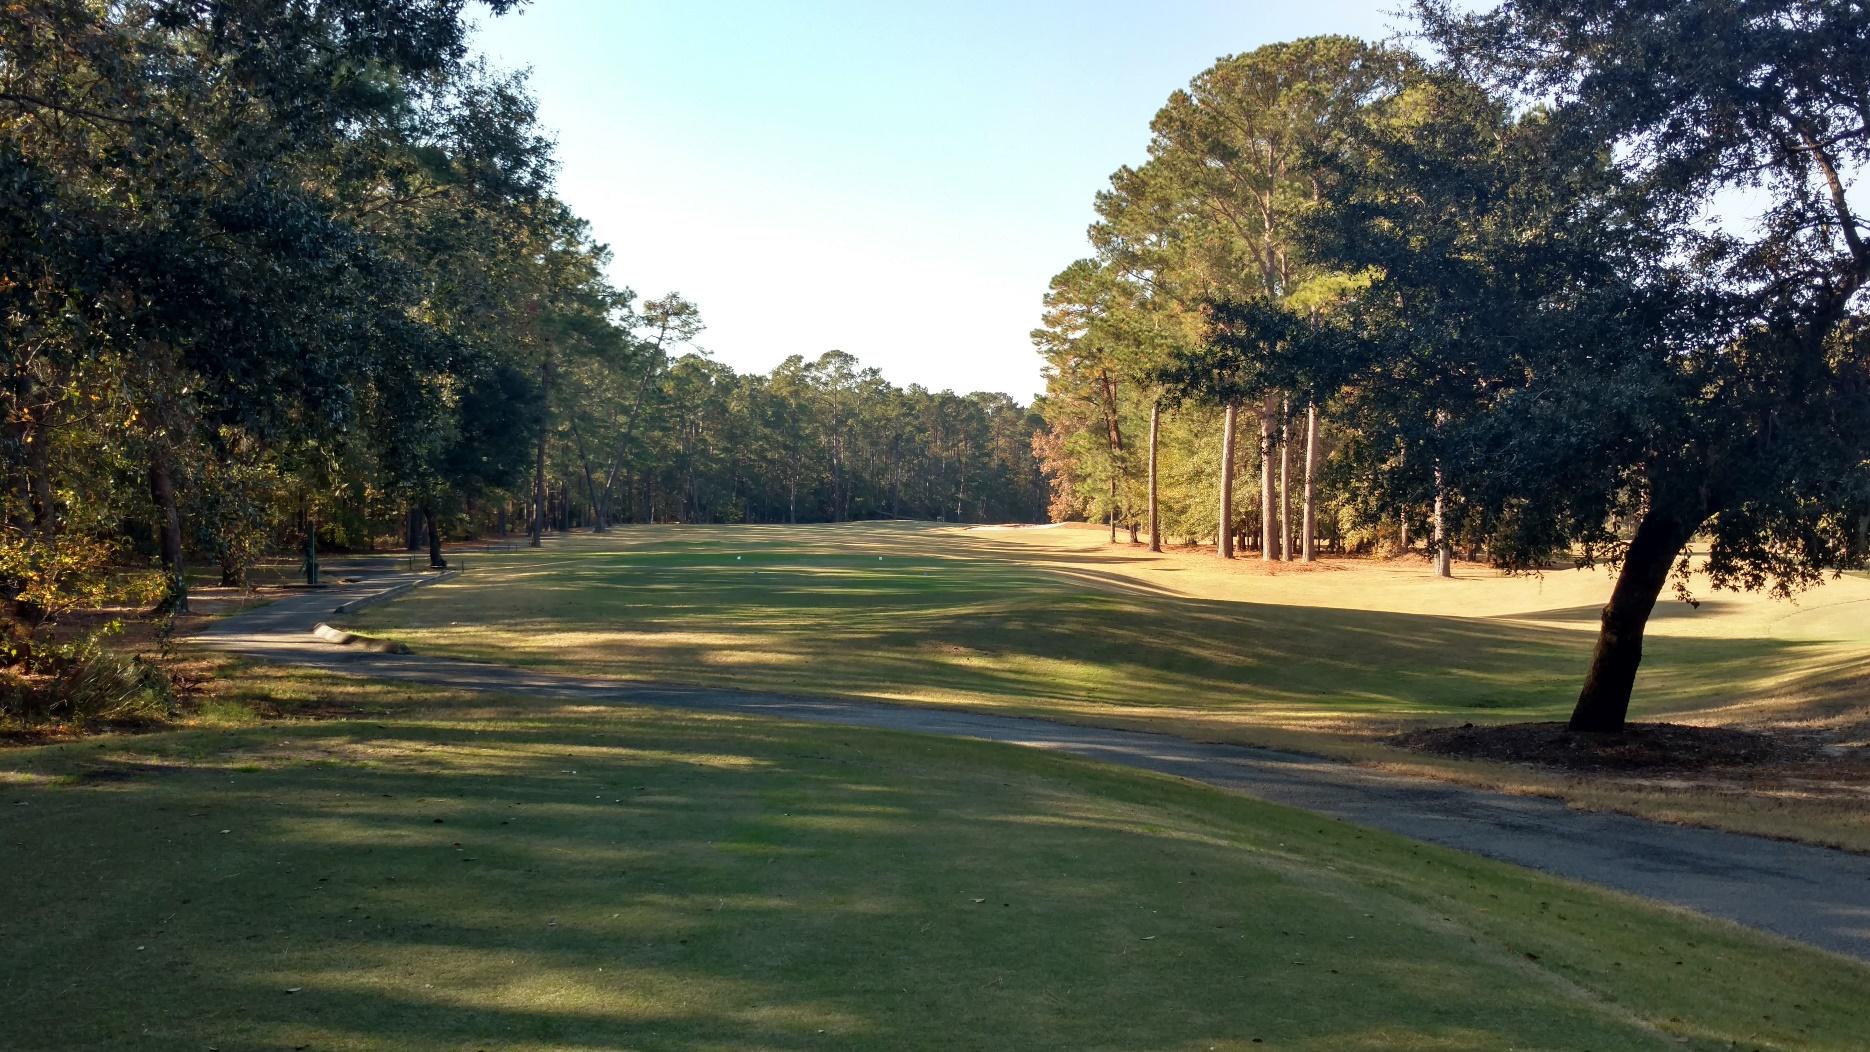 Eagle's Pointe Golf Club (Okatie, SC on 11/26/16 ...